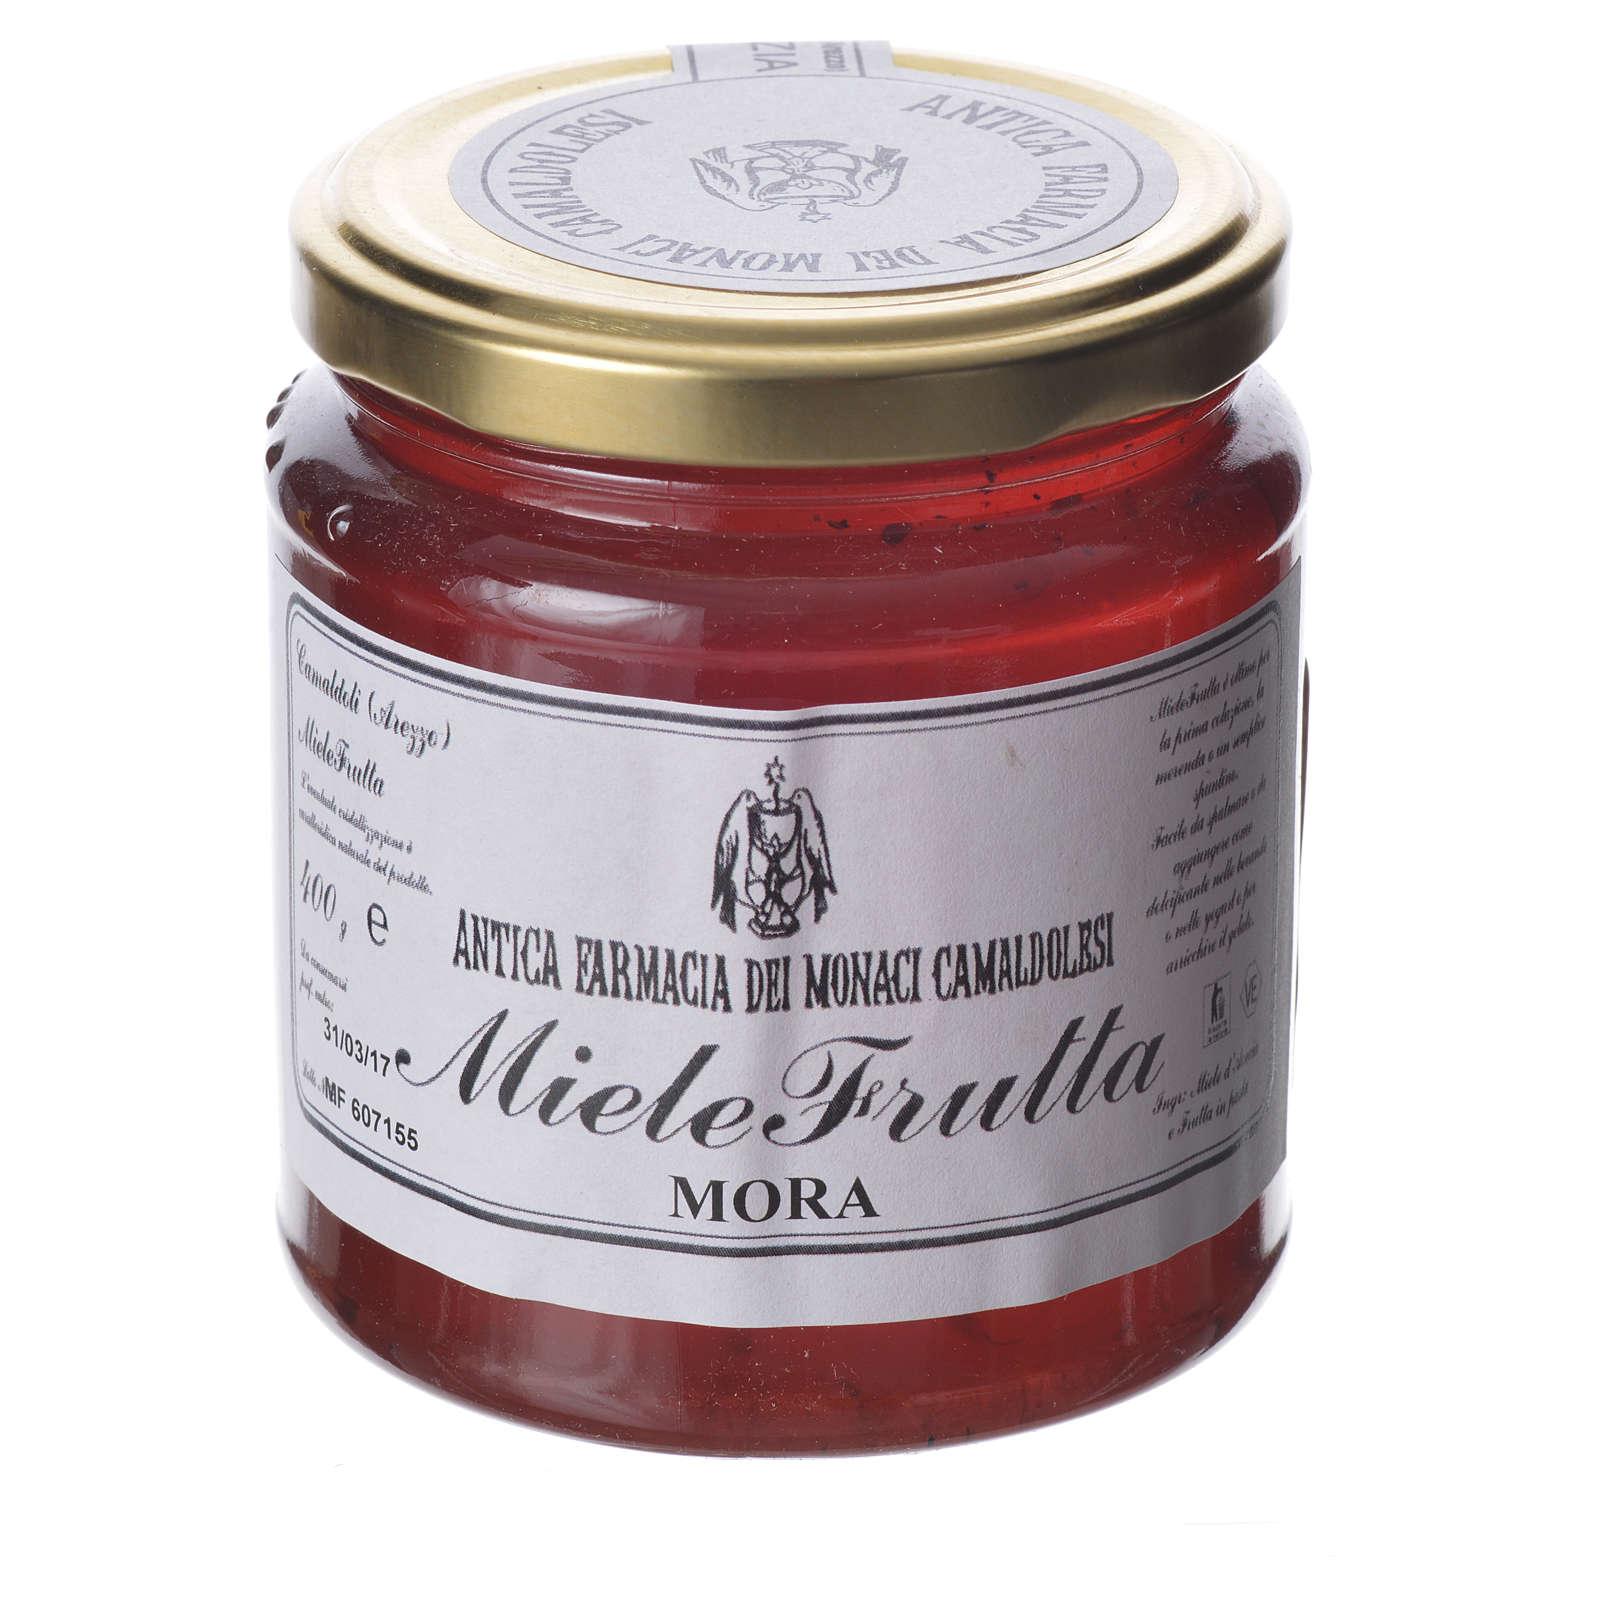 Honey with blackberry flavor 400g Camaldoli 3